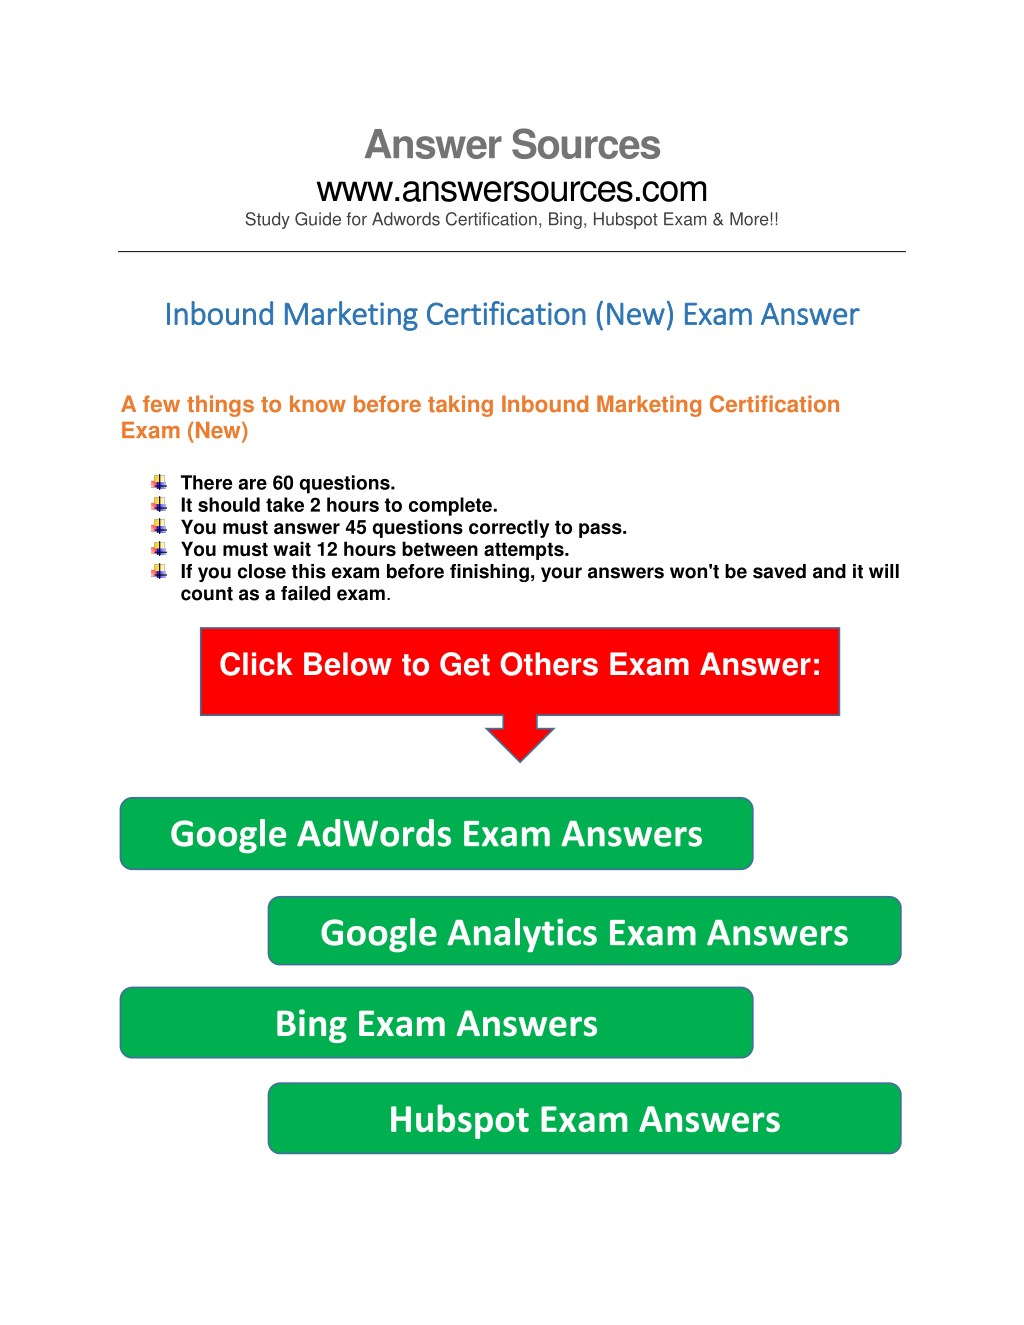 Ppt Inbound Marketing Exam Answers Powerpoint Presentation Id